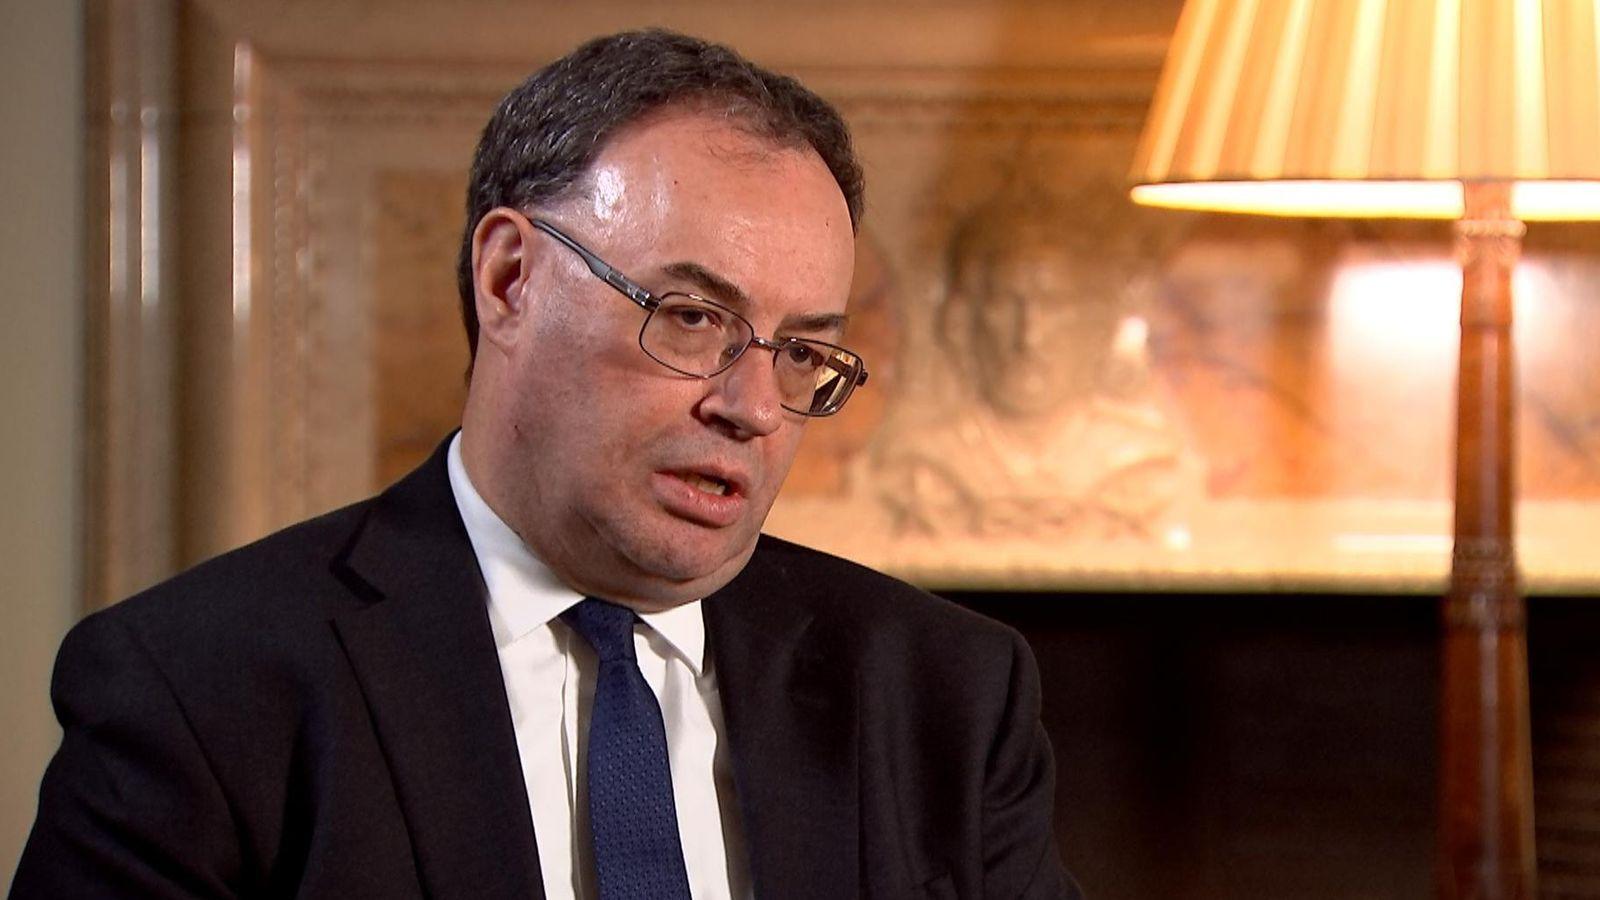 UK faces worst economic crash since records began, bank boss warns - EpicNews